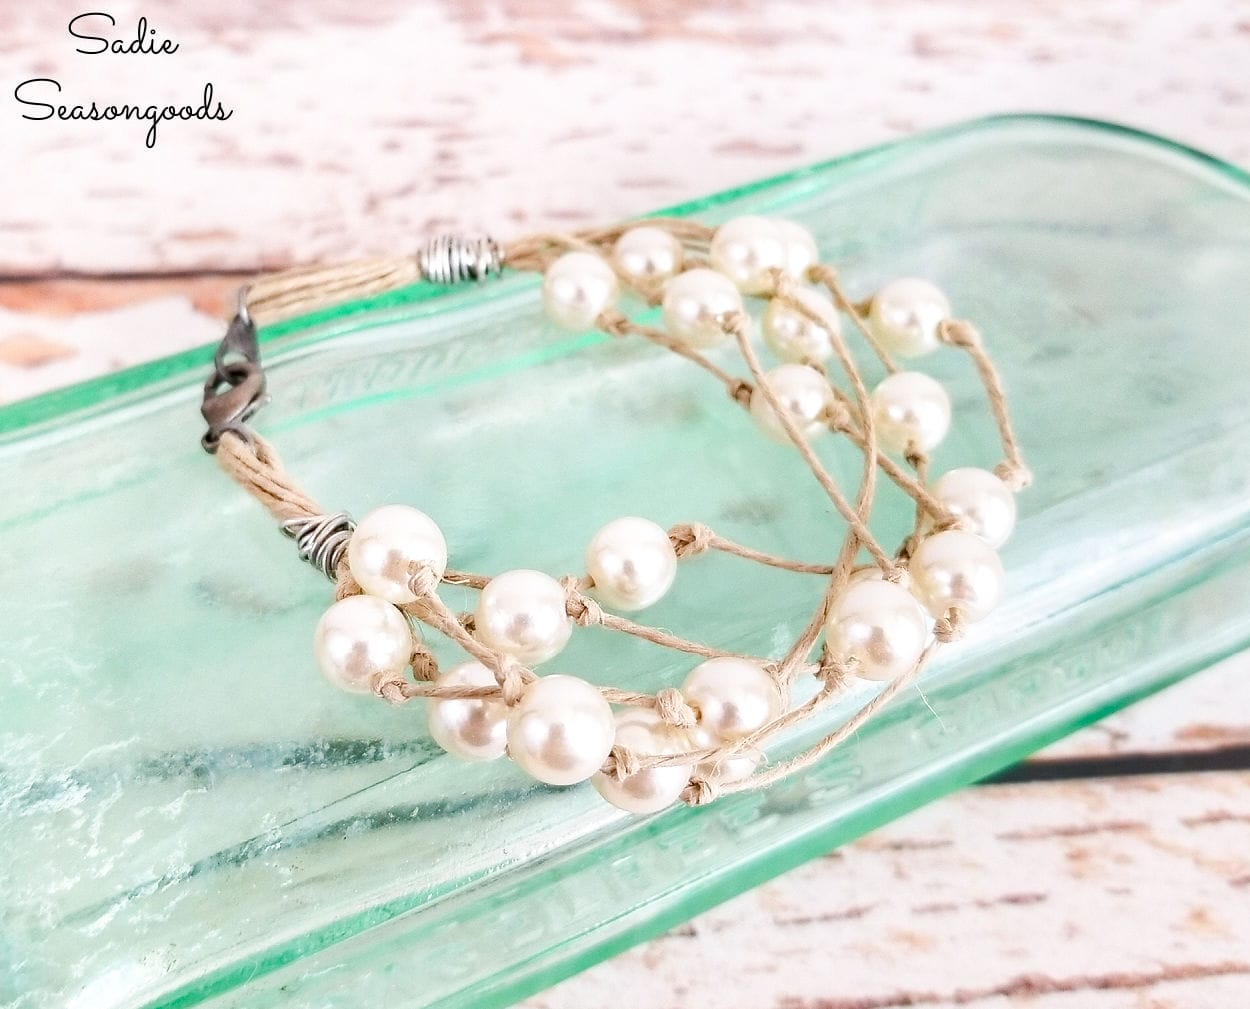 boho bracelet and beach themed jewelry